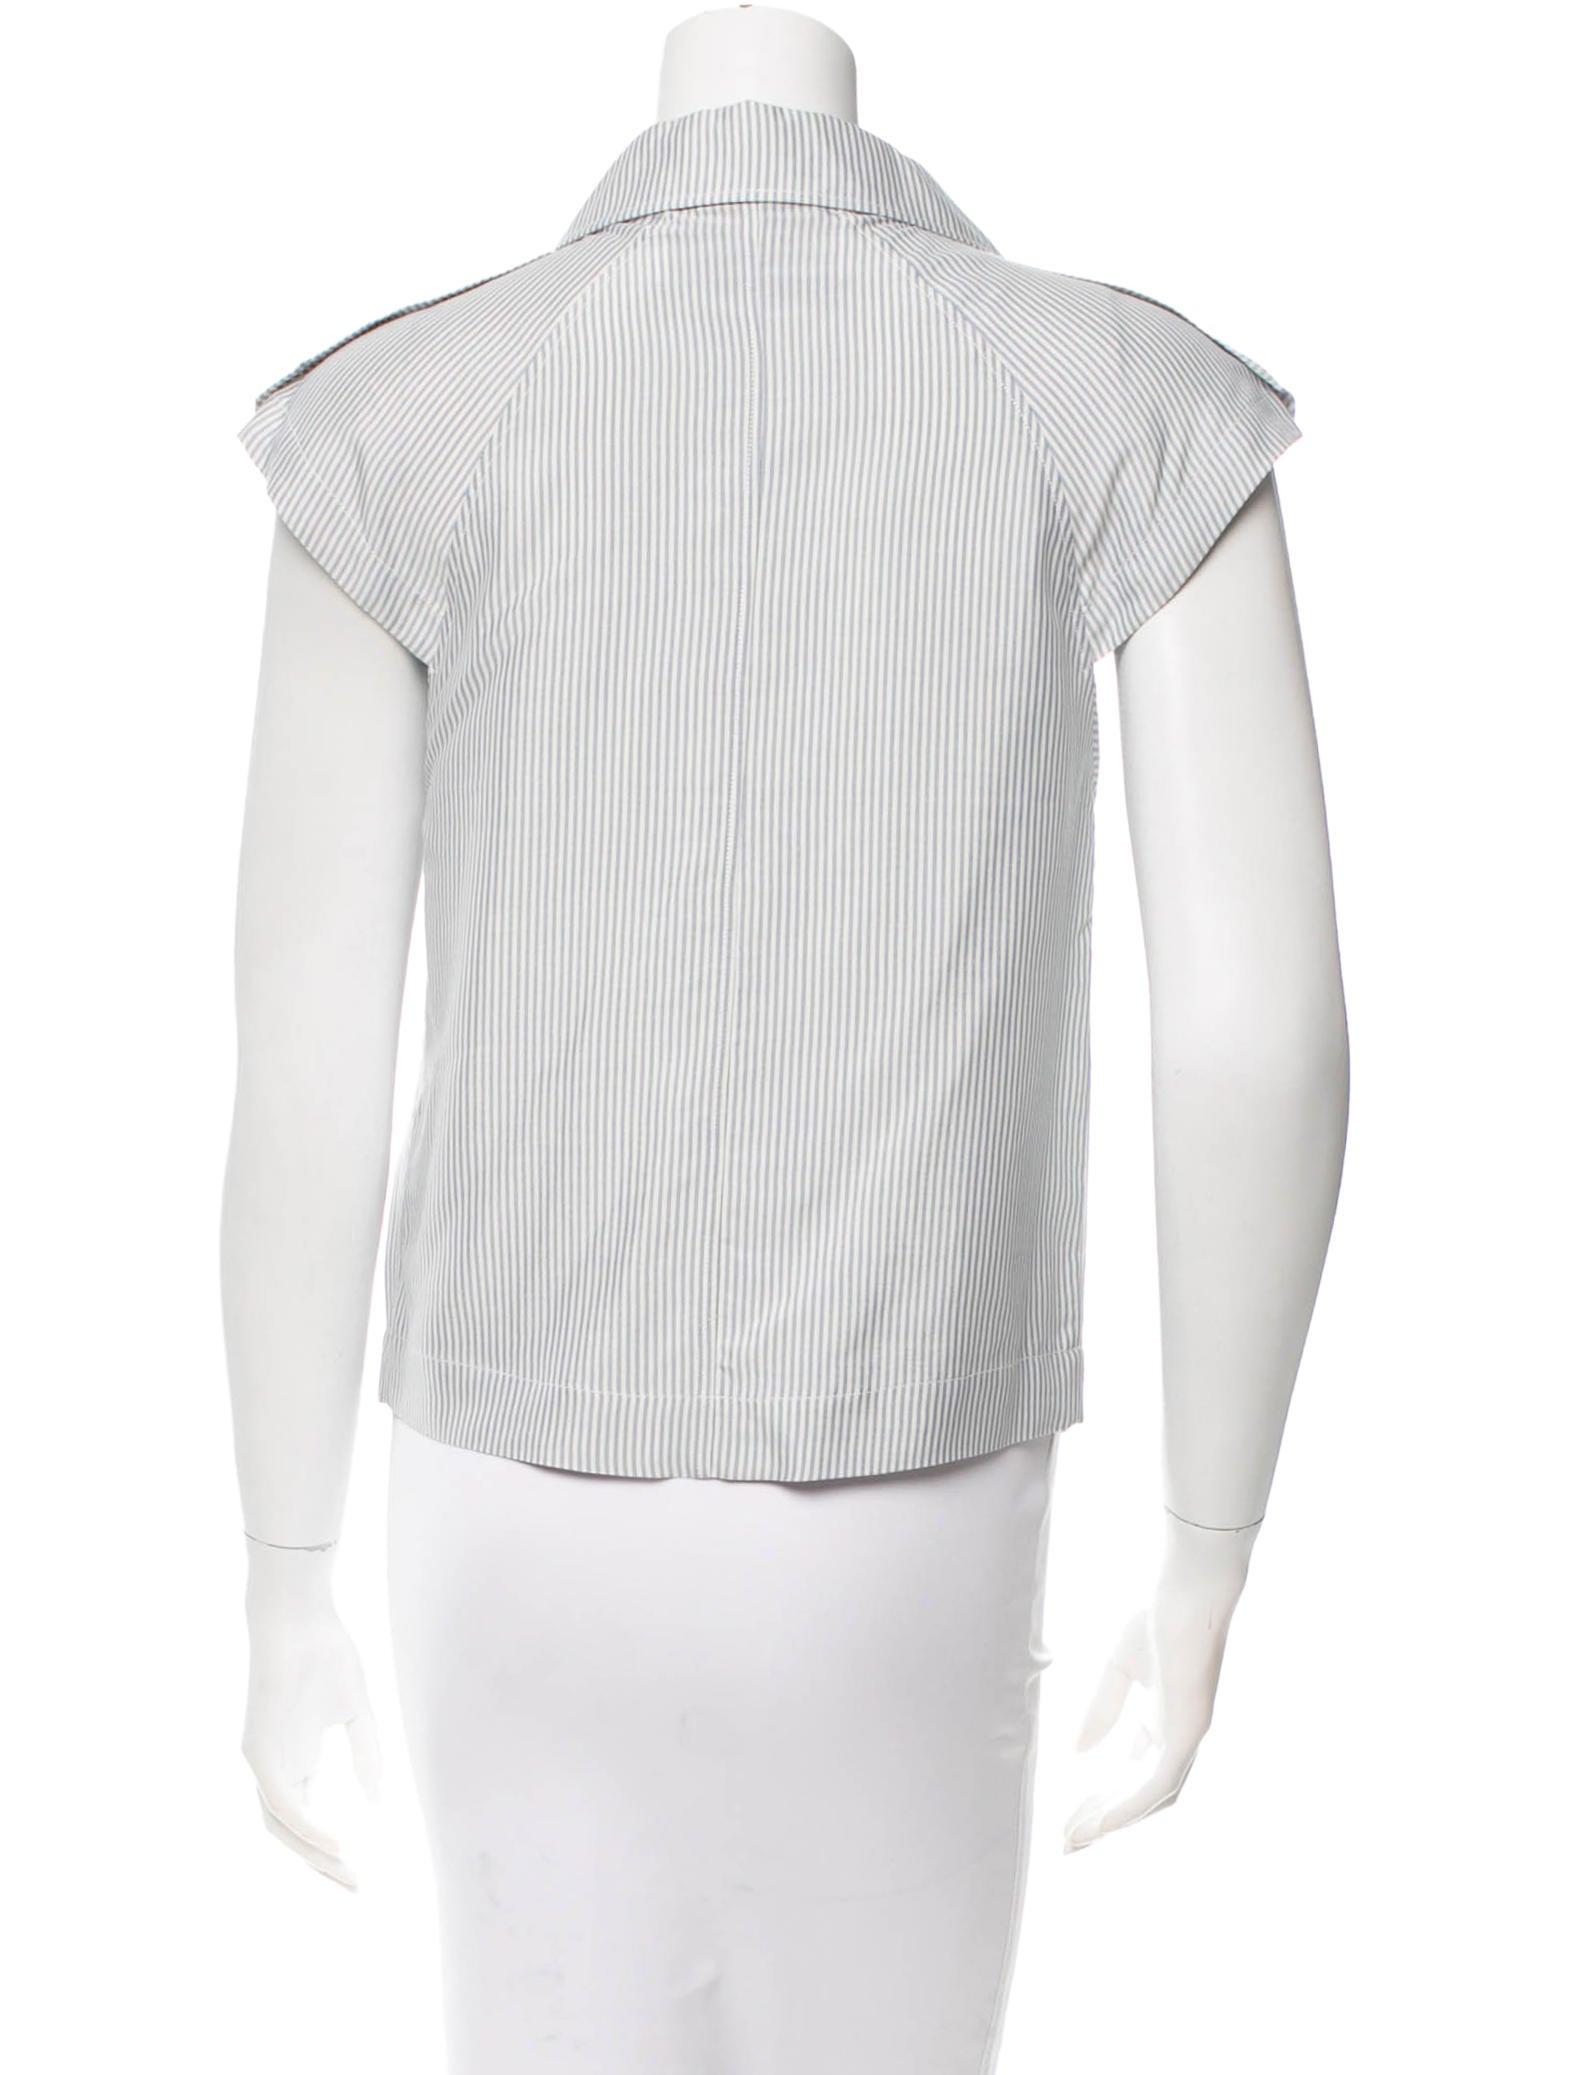 viktor rolf silk striped top clothing vik20722 the realreal. Black Bedroom Furniture Sets. Home Design Ideas